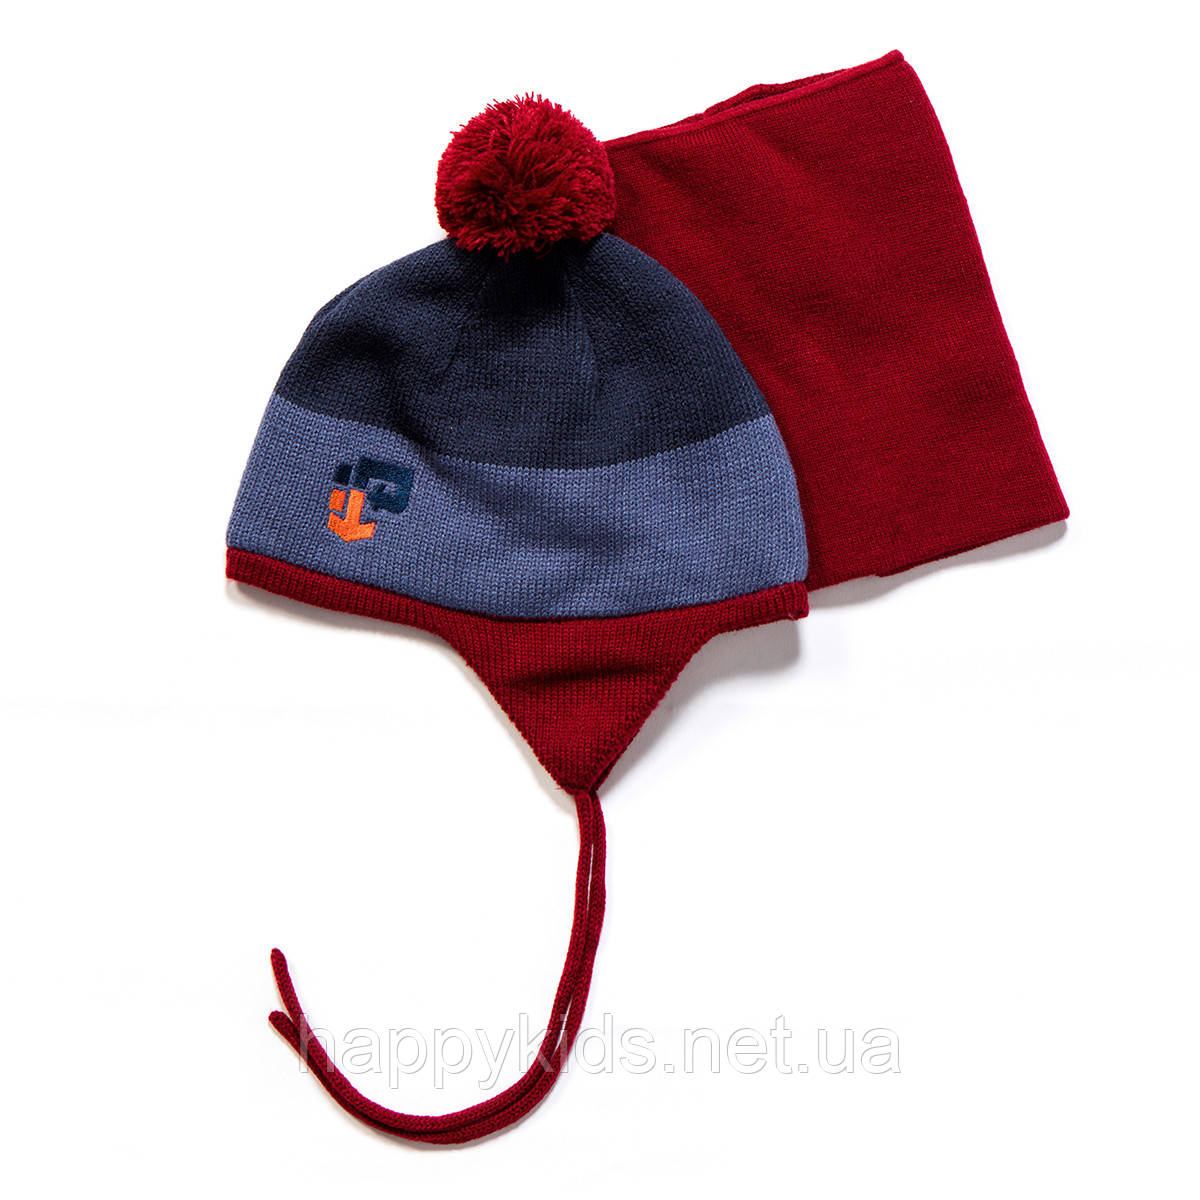 Зимняя шапка+манишка для мальчика PELUCHE F17 ACC 53 EG Spicy Red Pepper. Размеры 3/5 и 6/8.